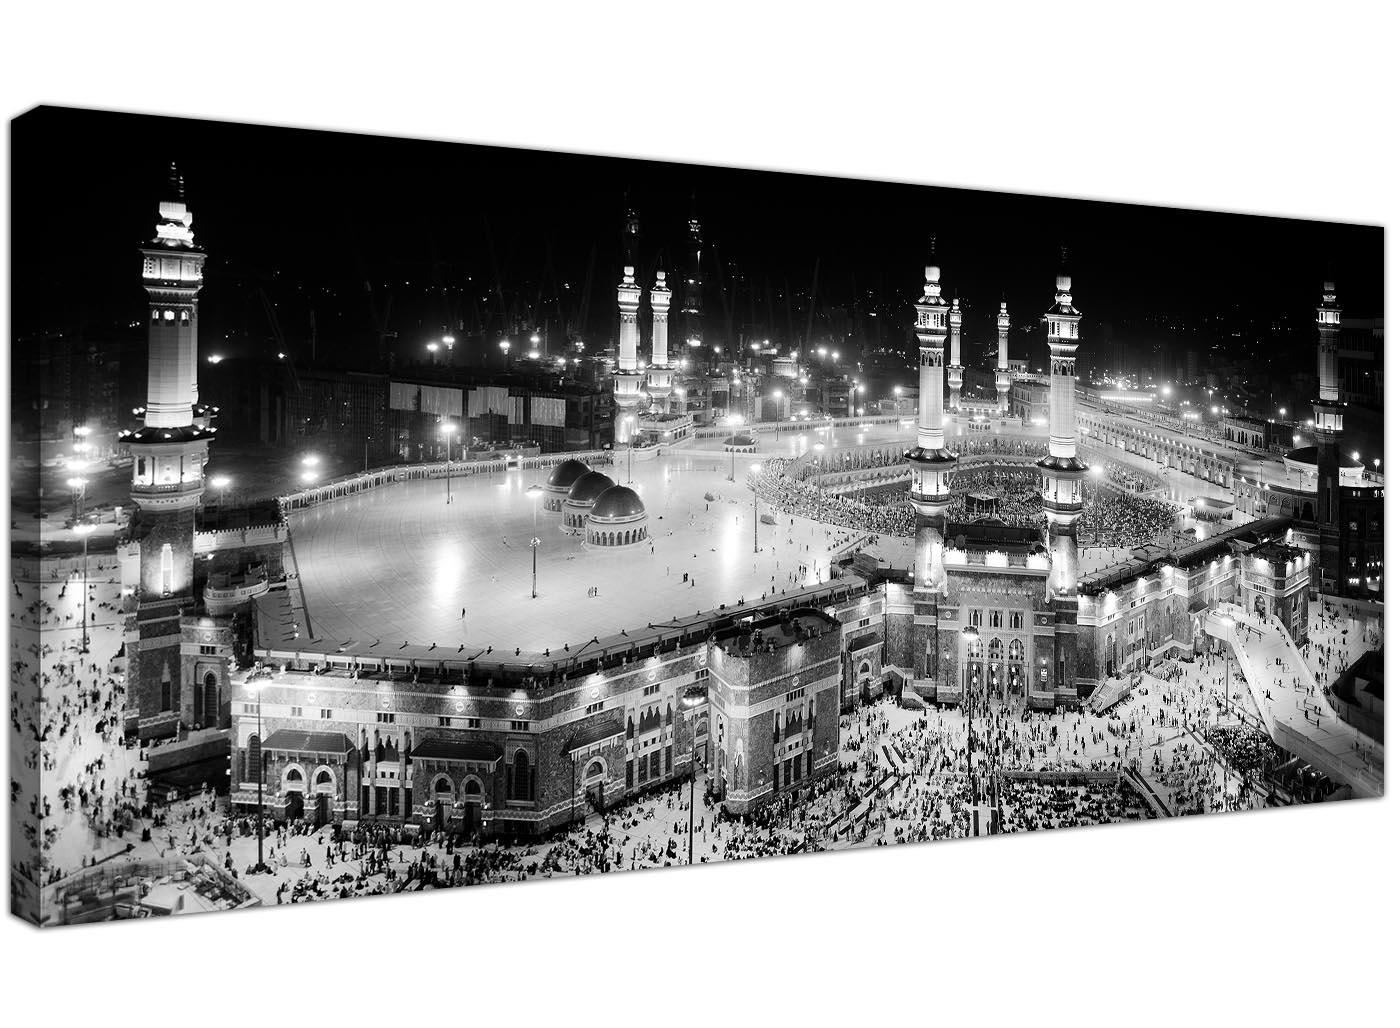 Details about black and white islamic canvas art prints muslim hajj kaaba pilgrimage mecca